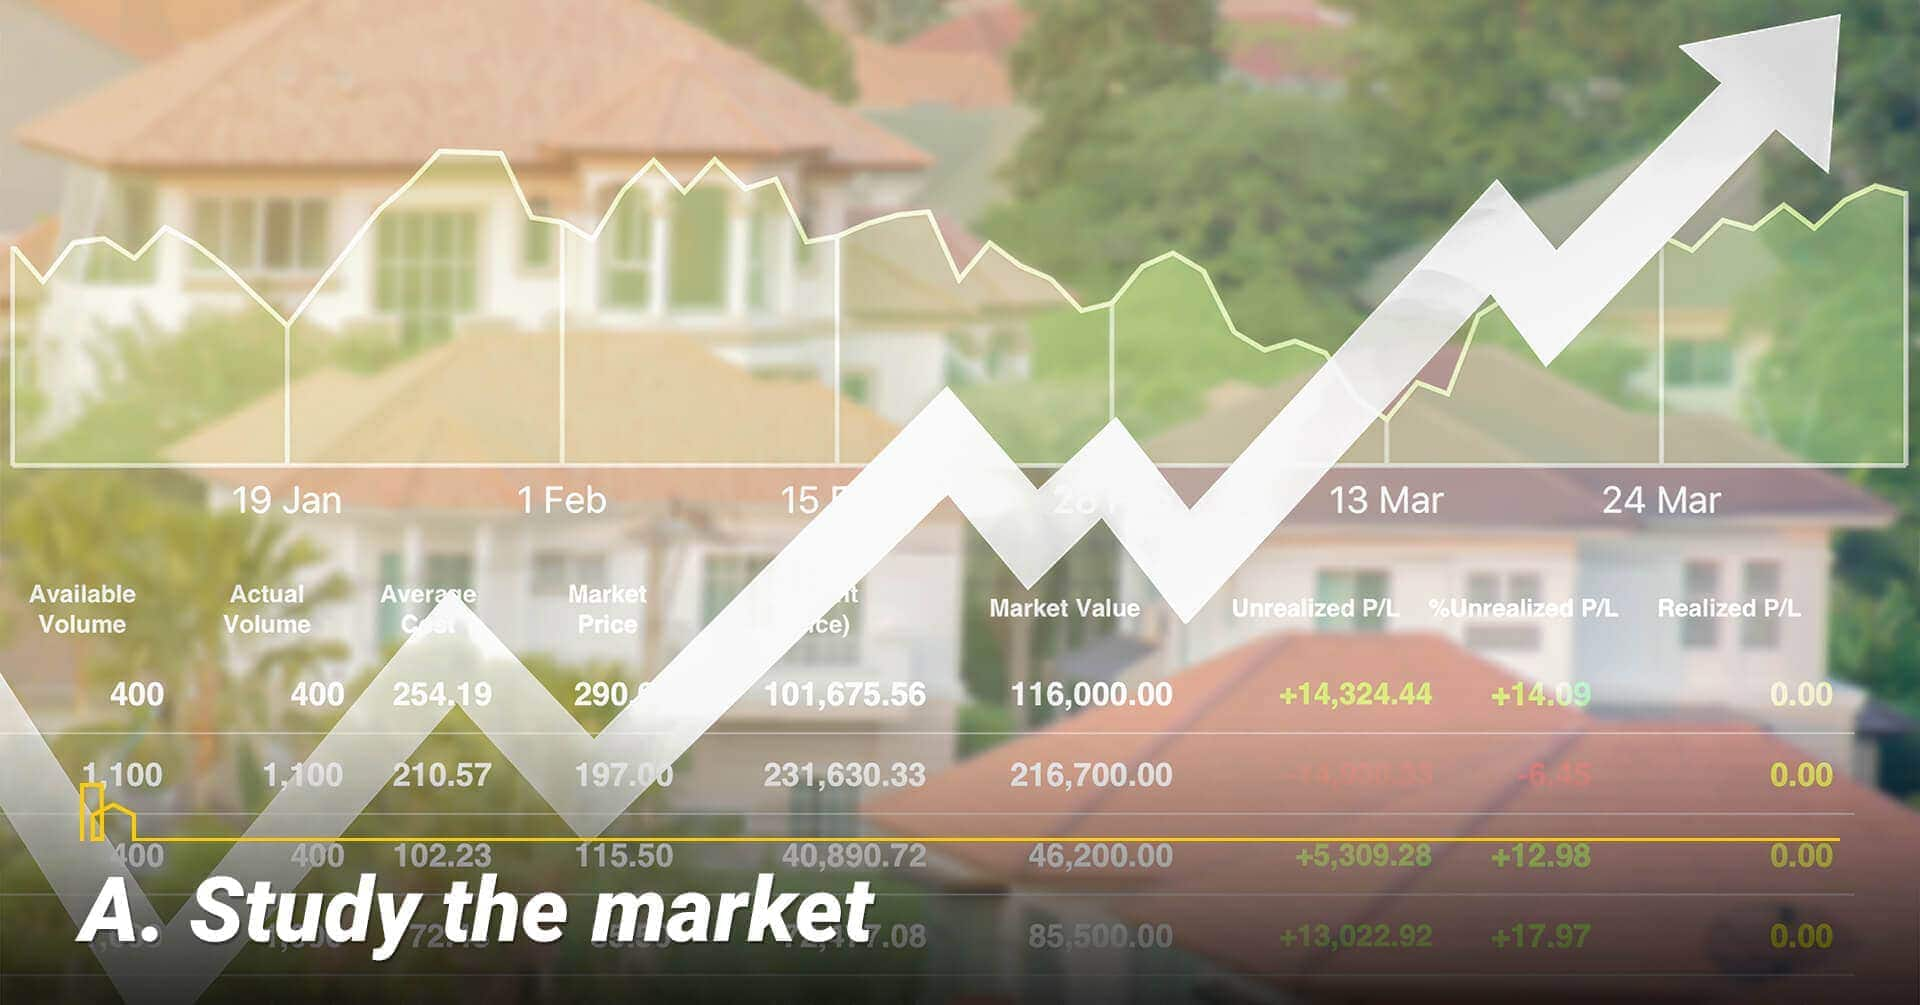 Study the market, do your analysis